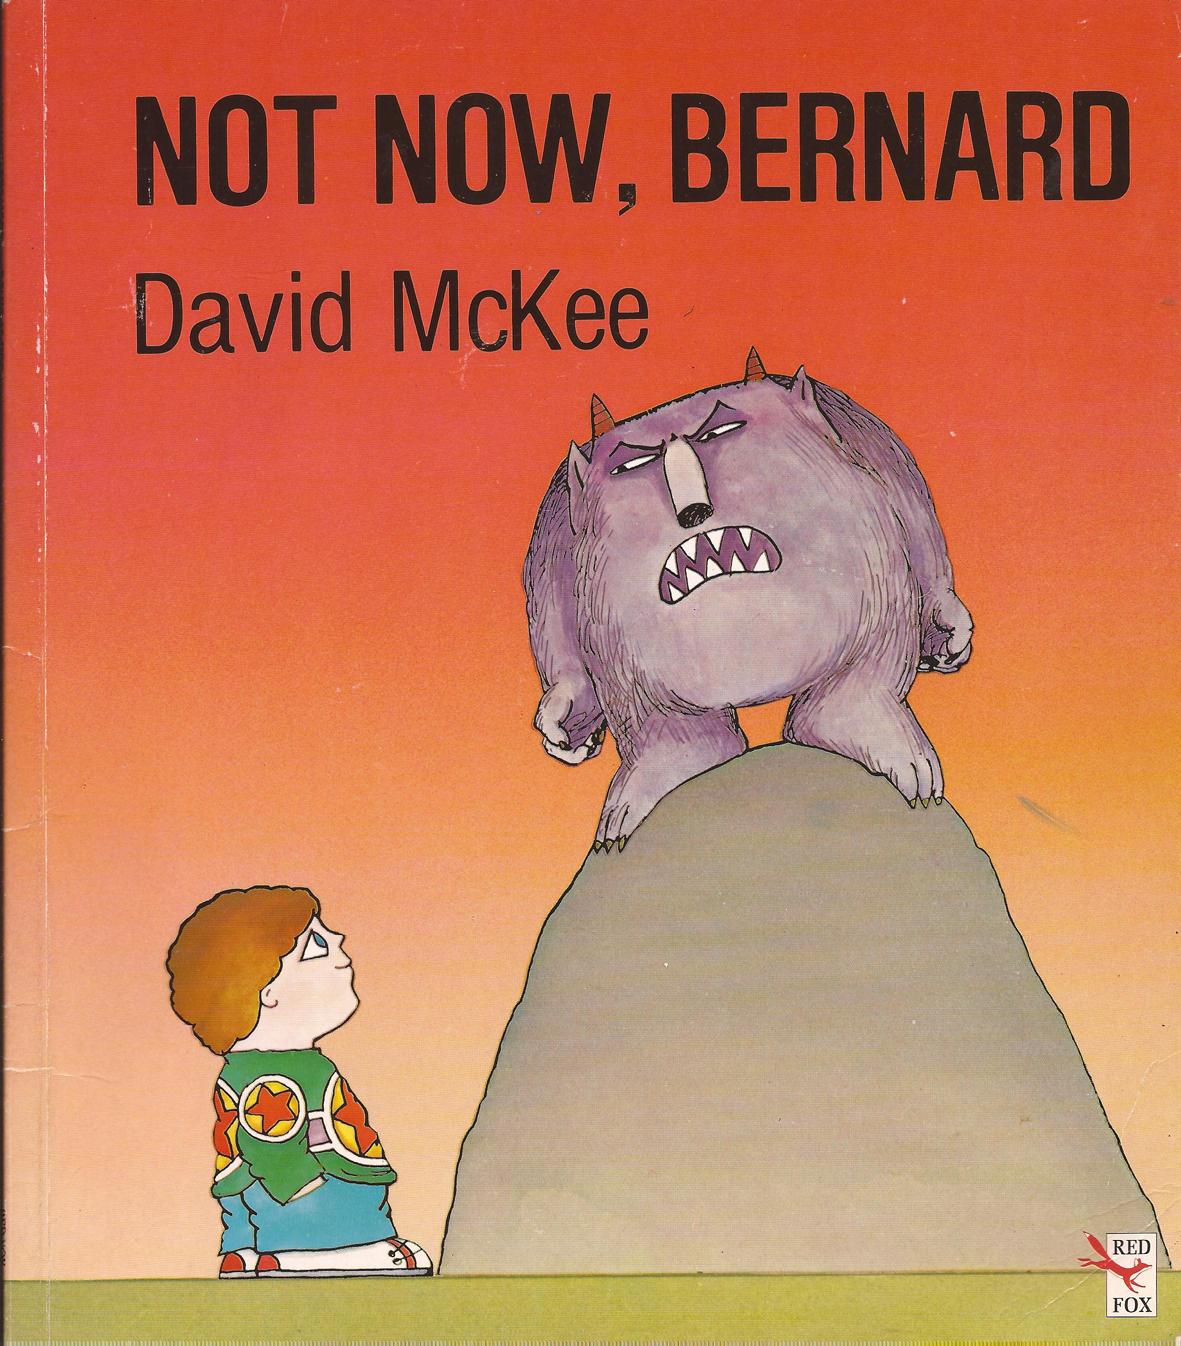 Institute of childrens literature review